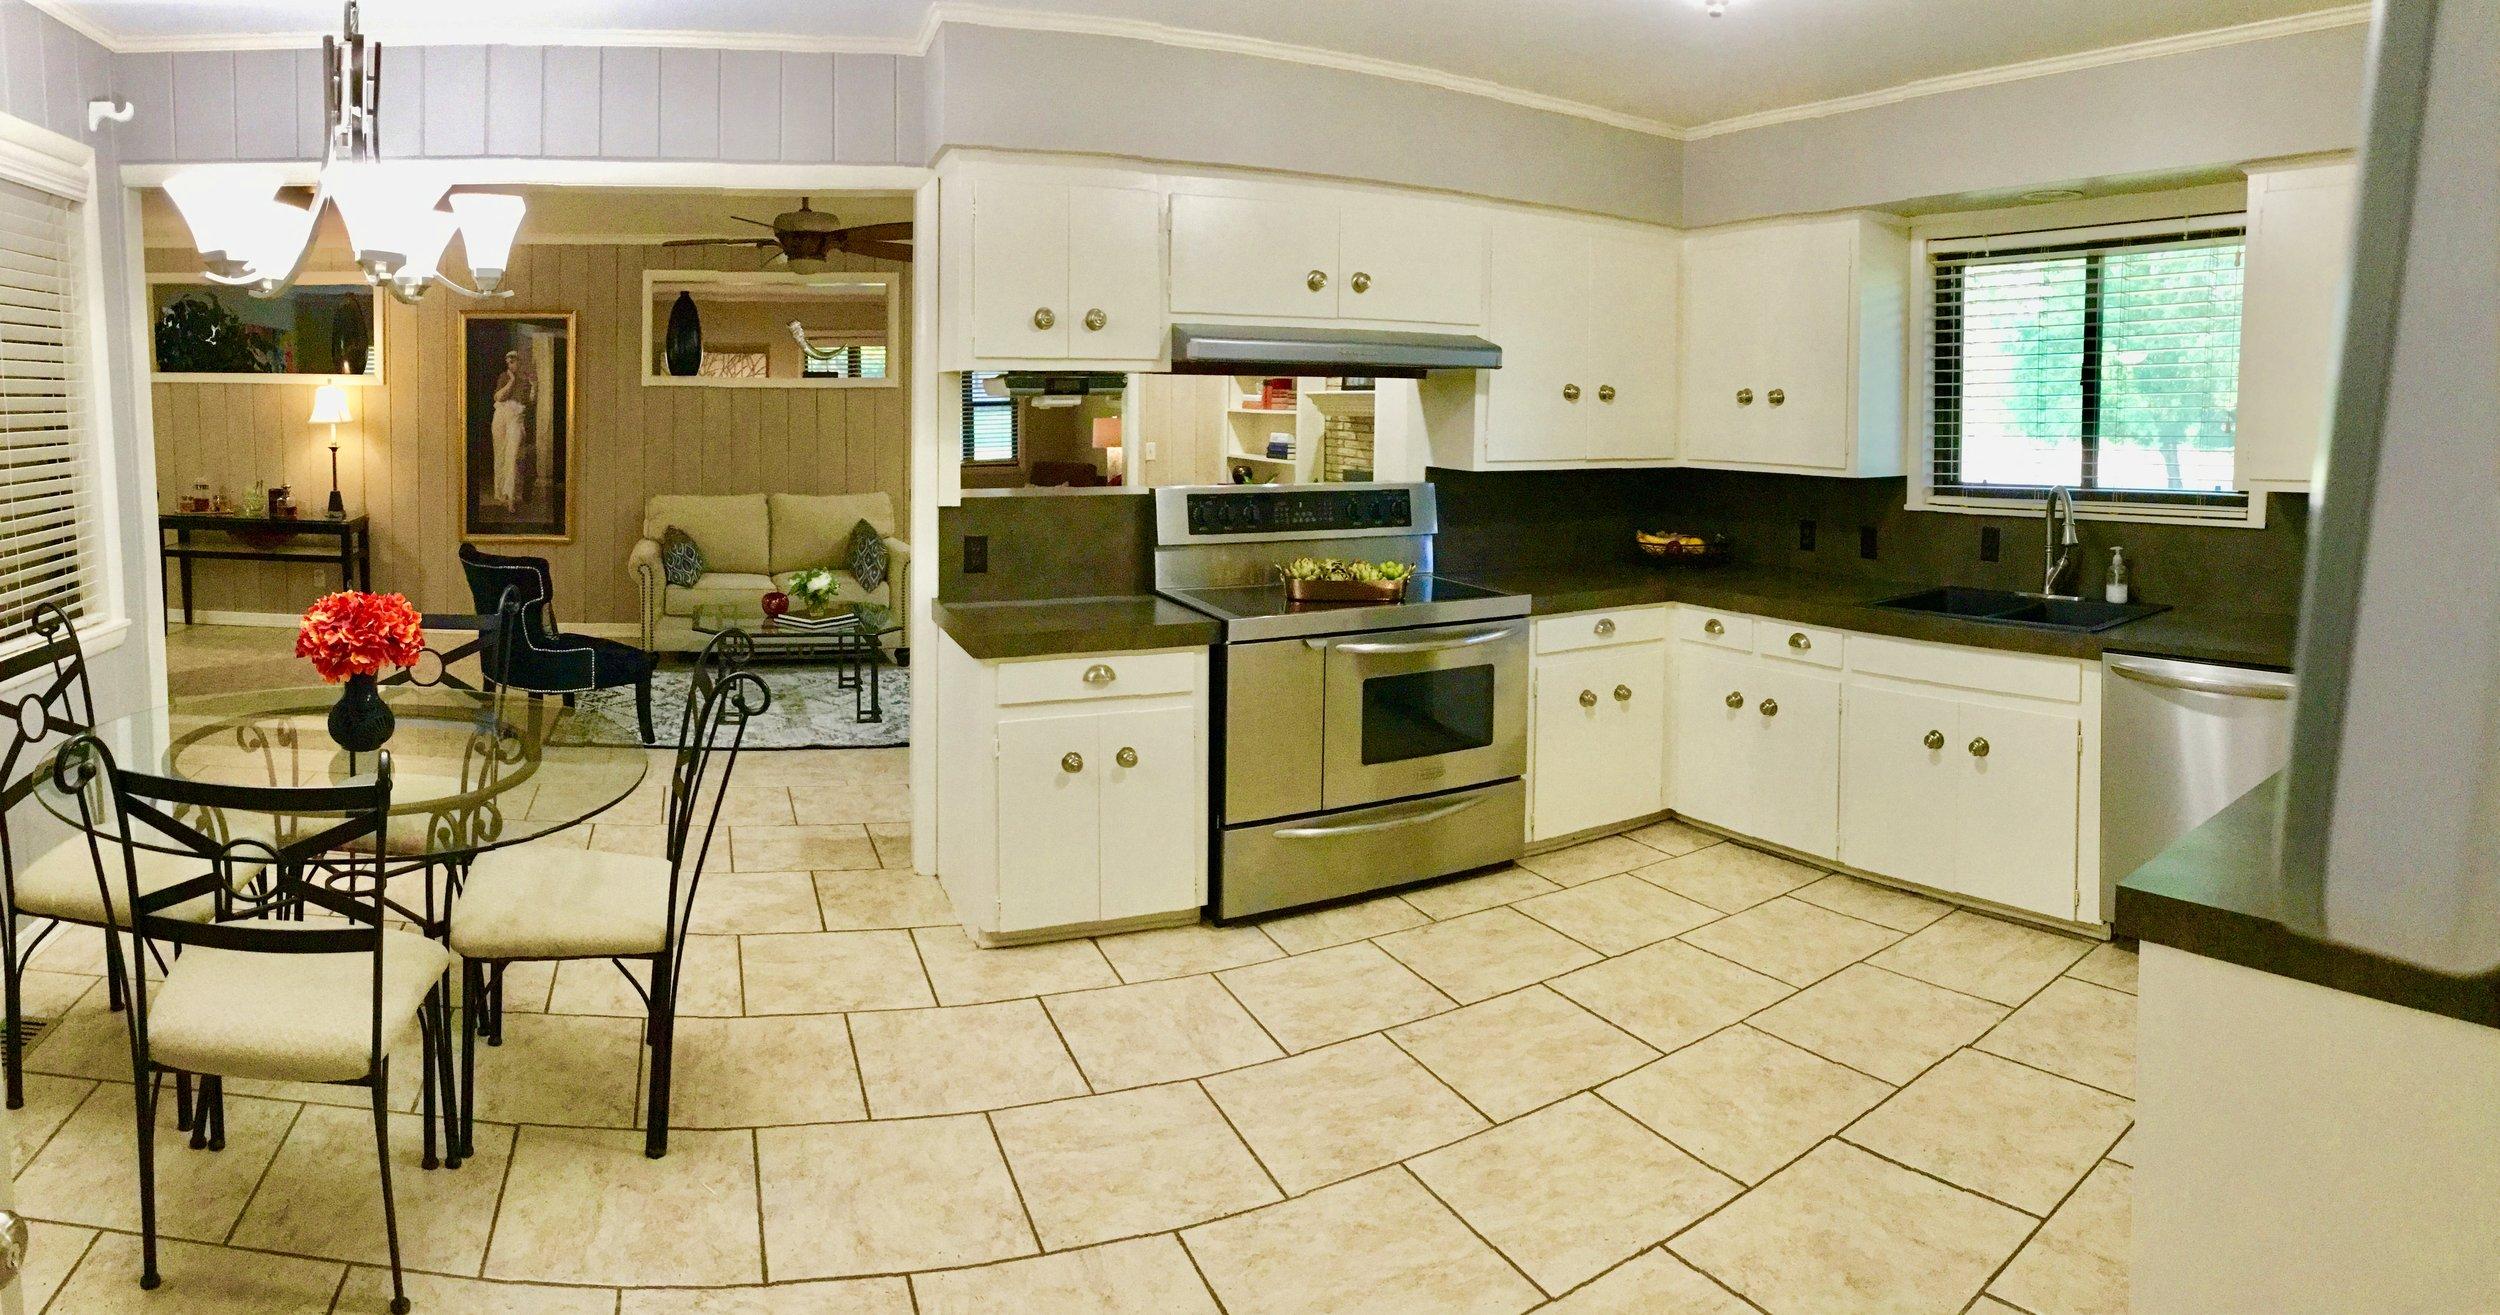 Staging Tulsa - Patrick Henry 4 Bedroom Kitchen.jpg